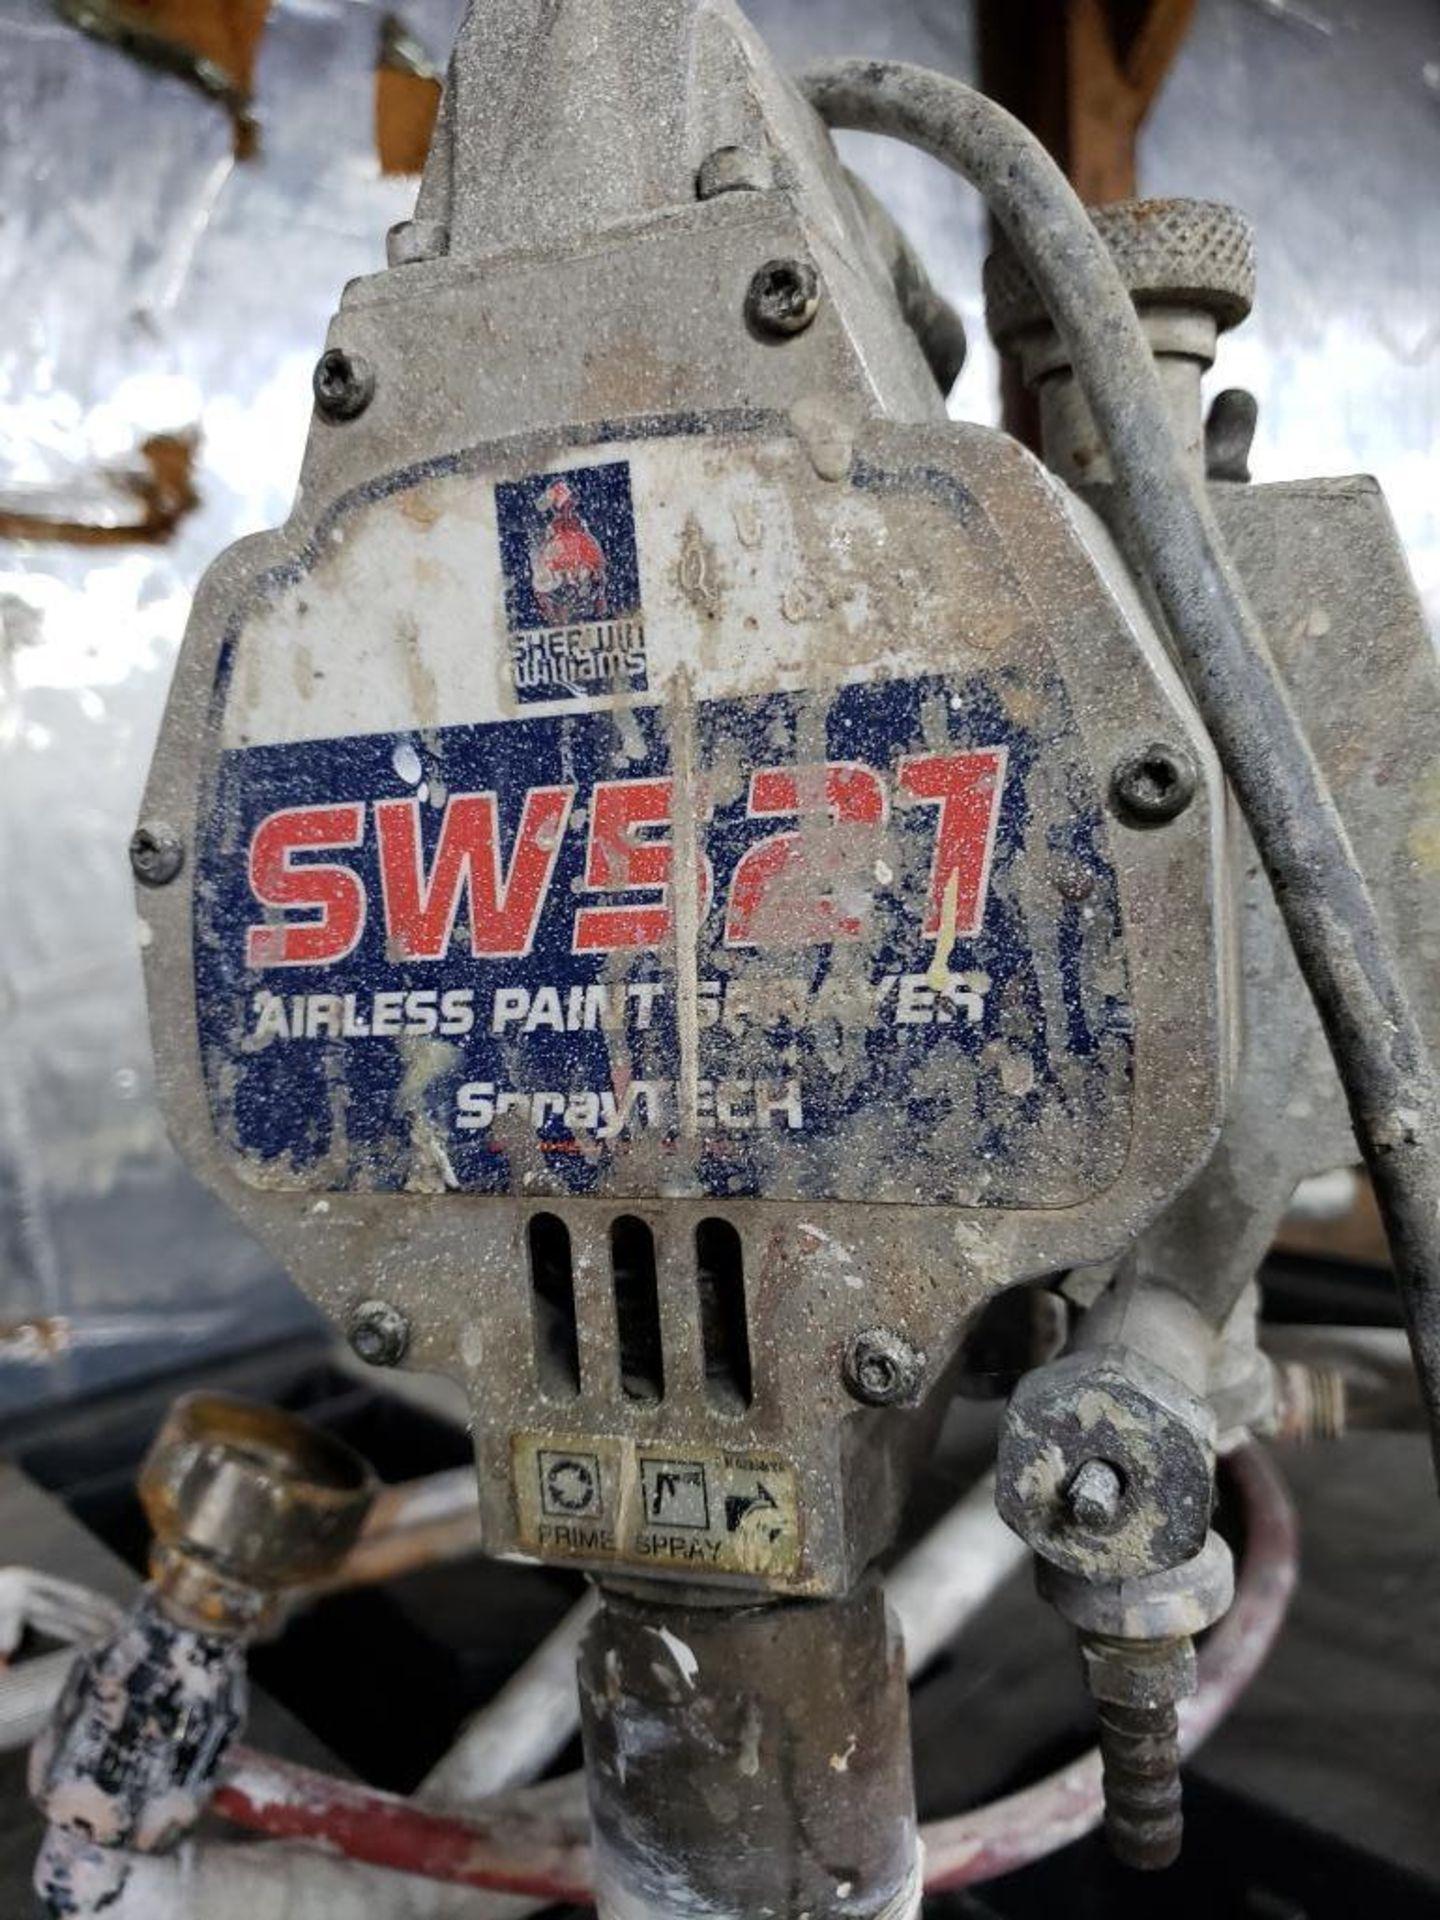 Lot 153 - Sherwin Williams Spraytech airless paint sprayer. Model SW521.